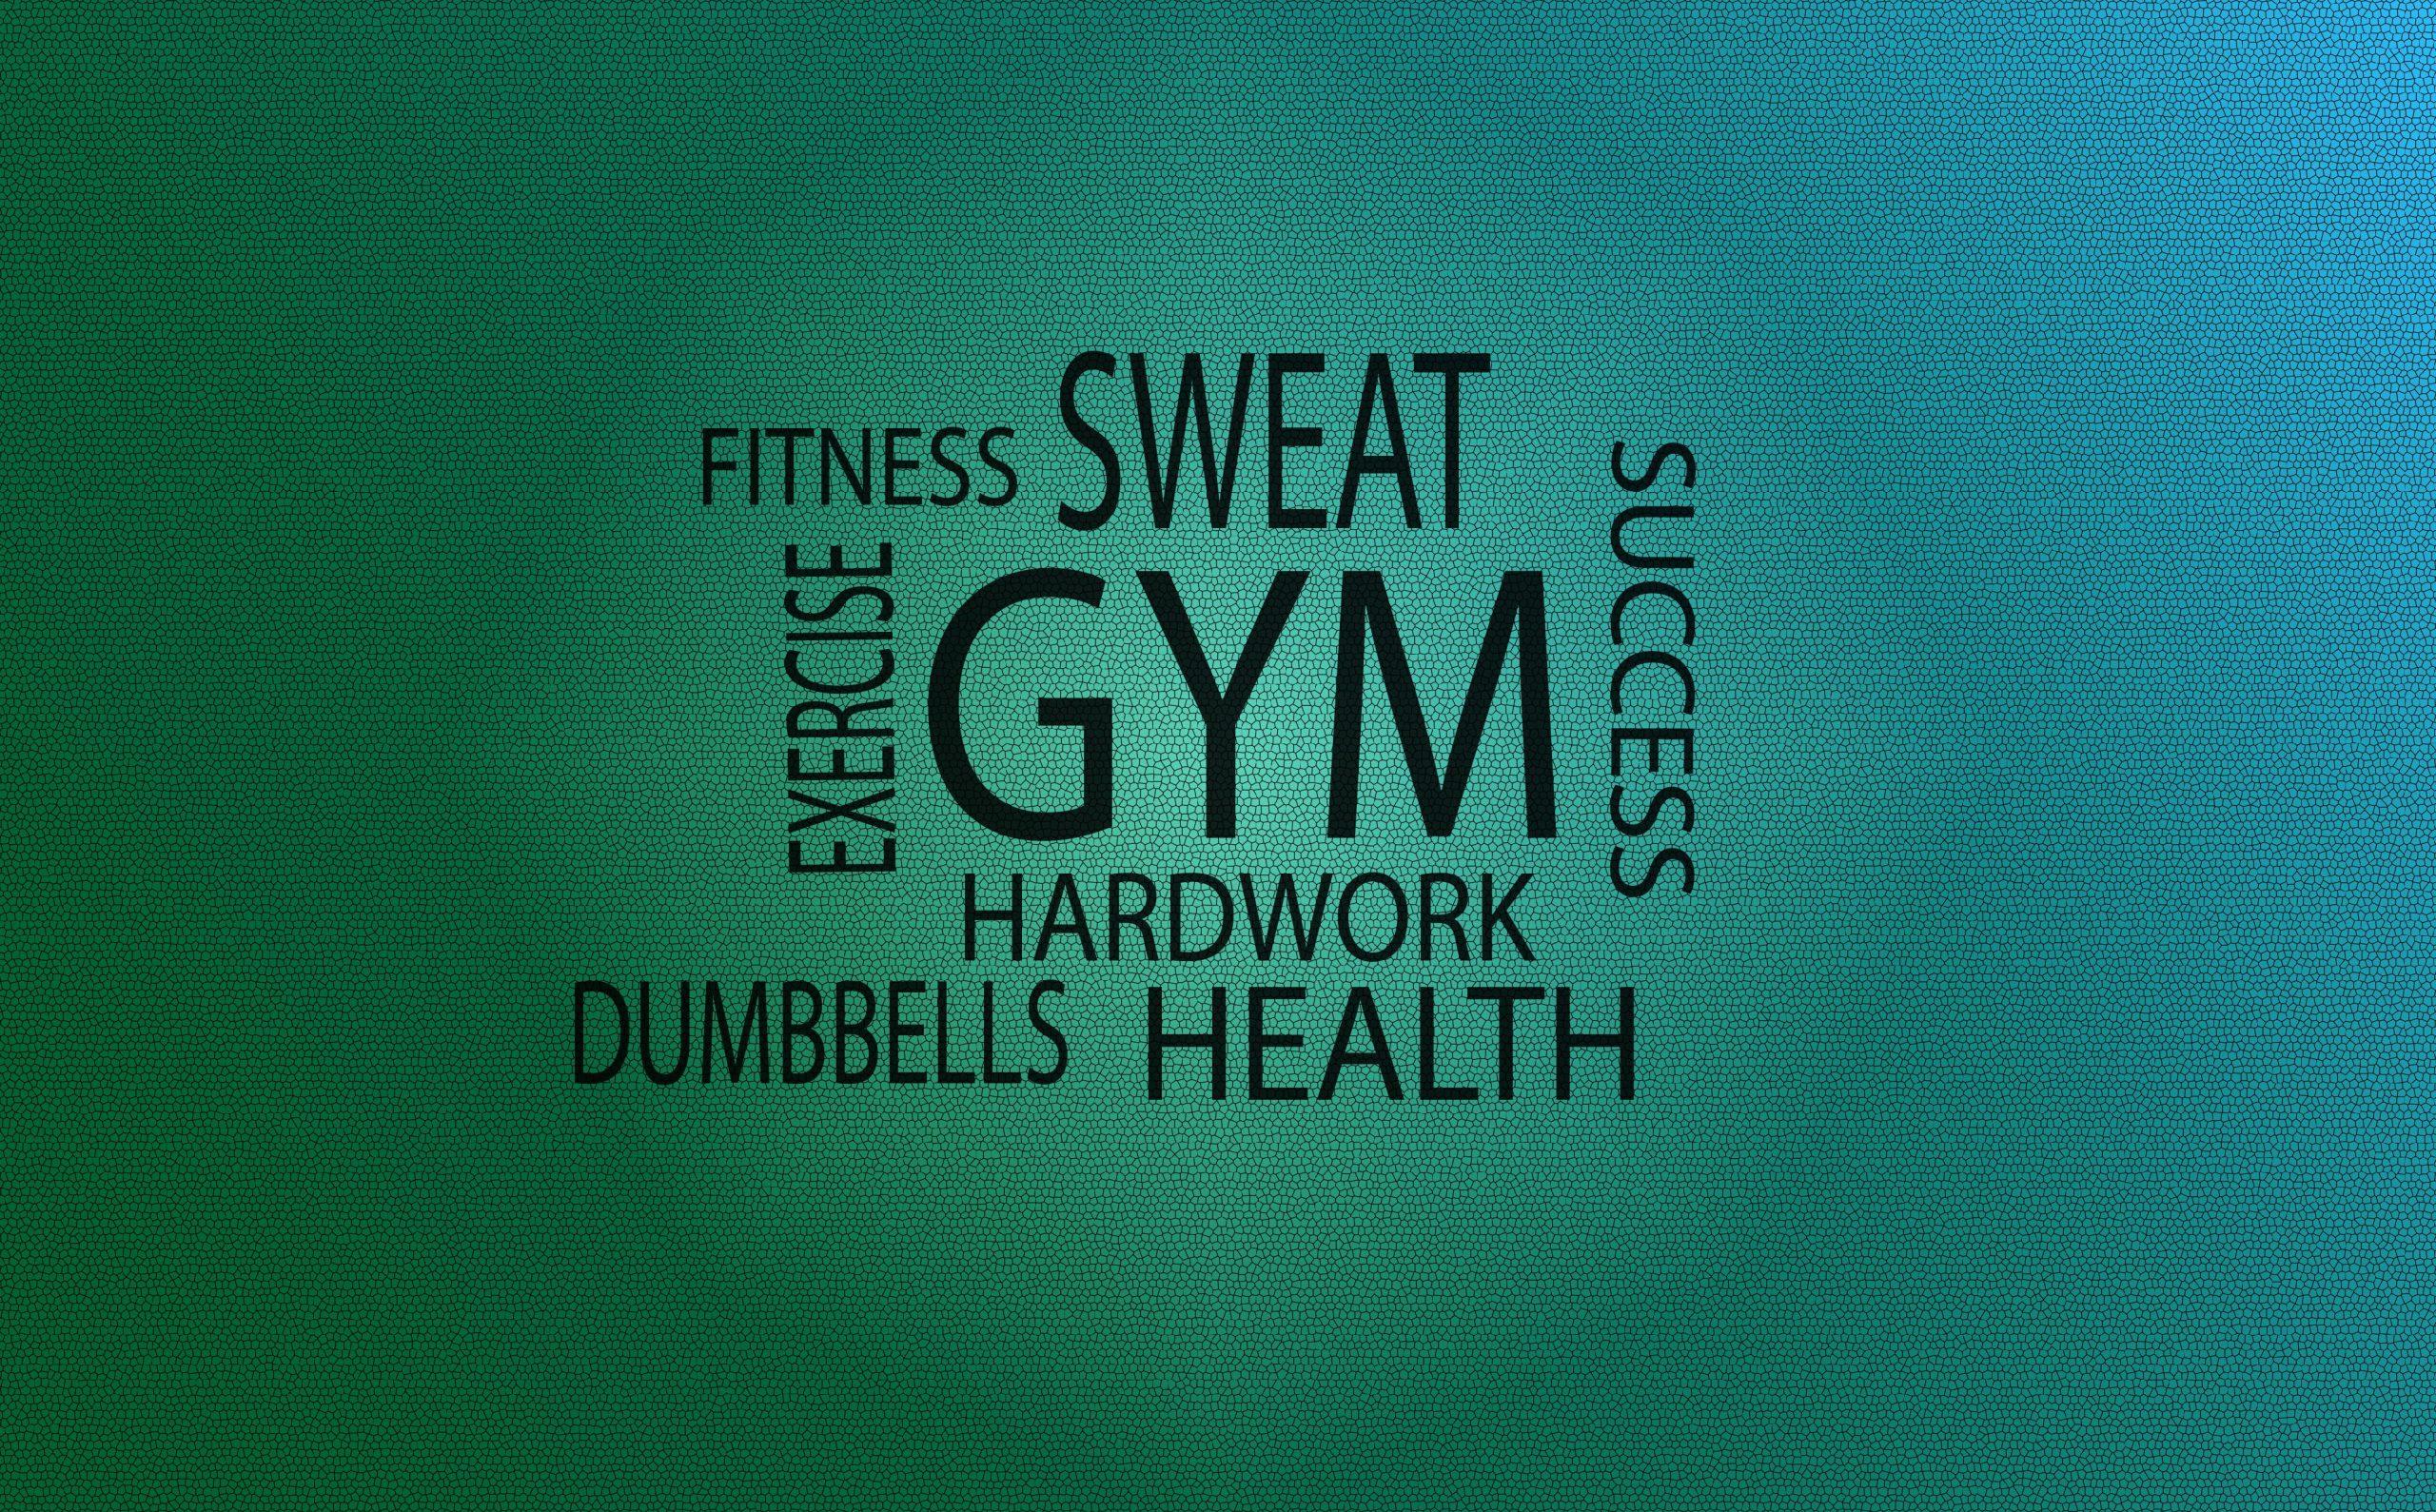 Gym synonyms wallpaper